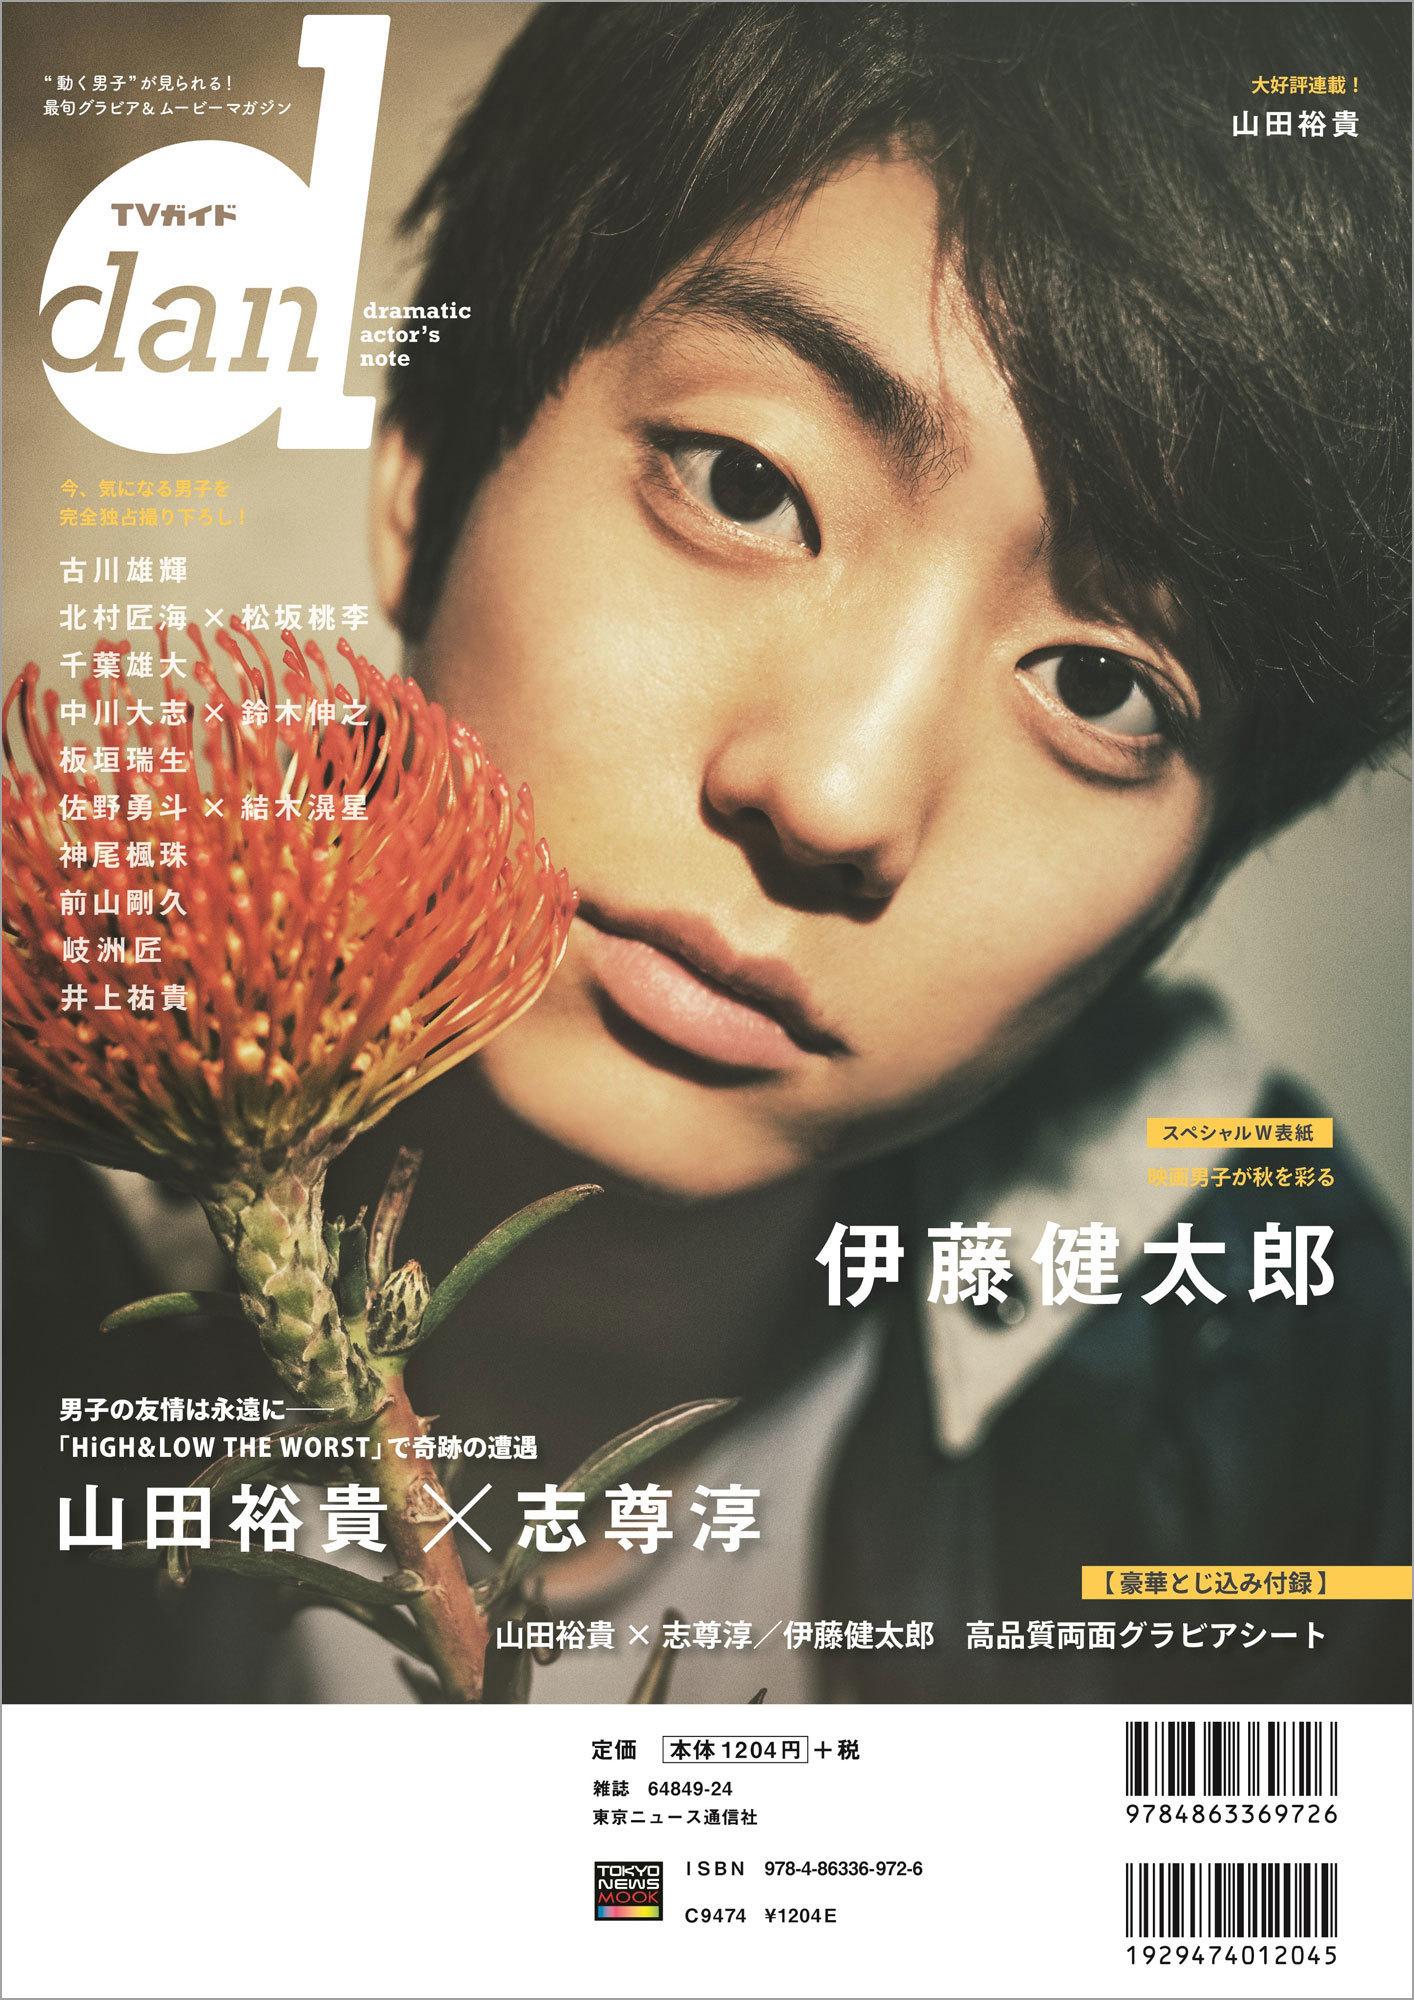 「TVガイドdan vol.26」(東京ニュース通信社刊)